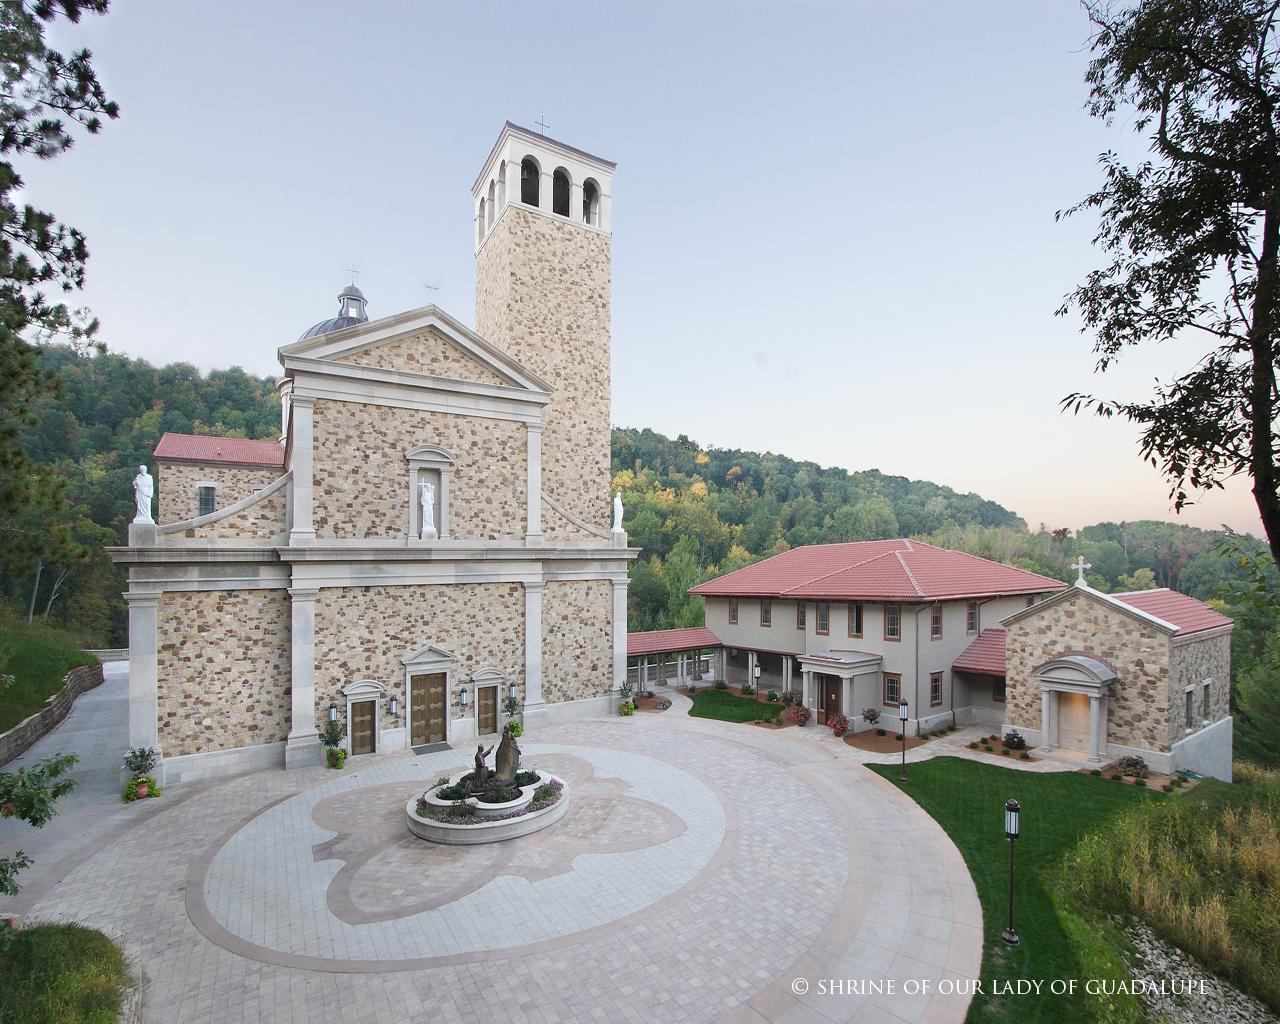 shrine-church-plaza-1280x1024.jpg